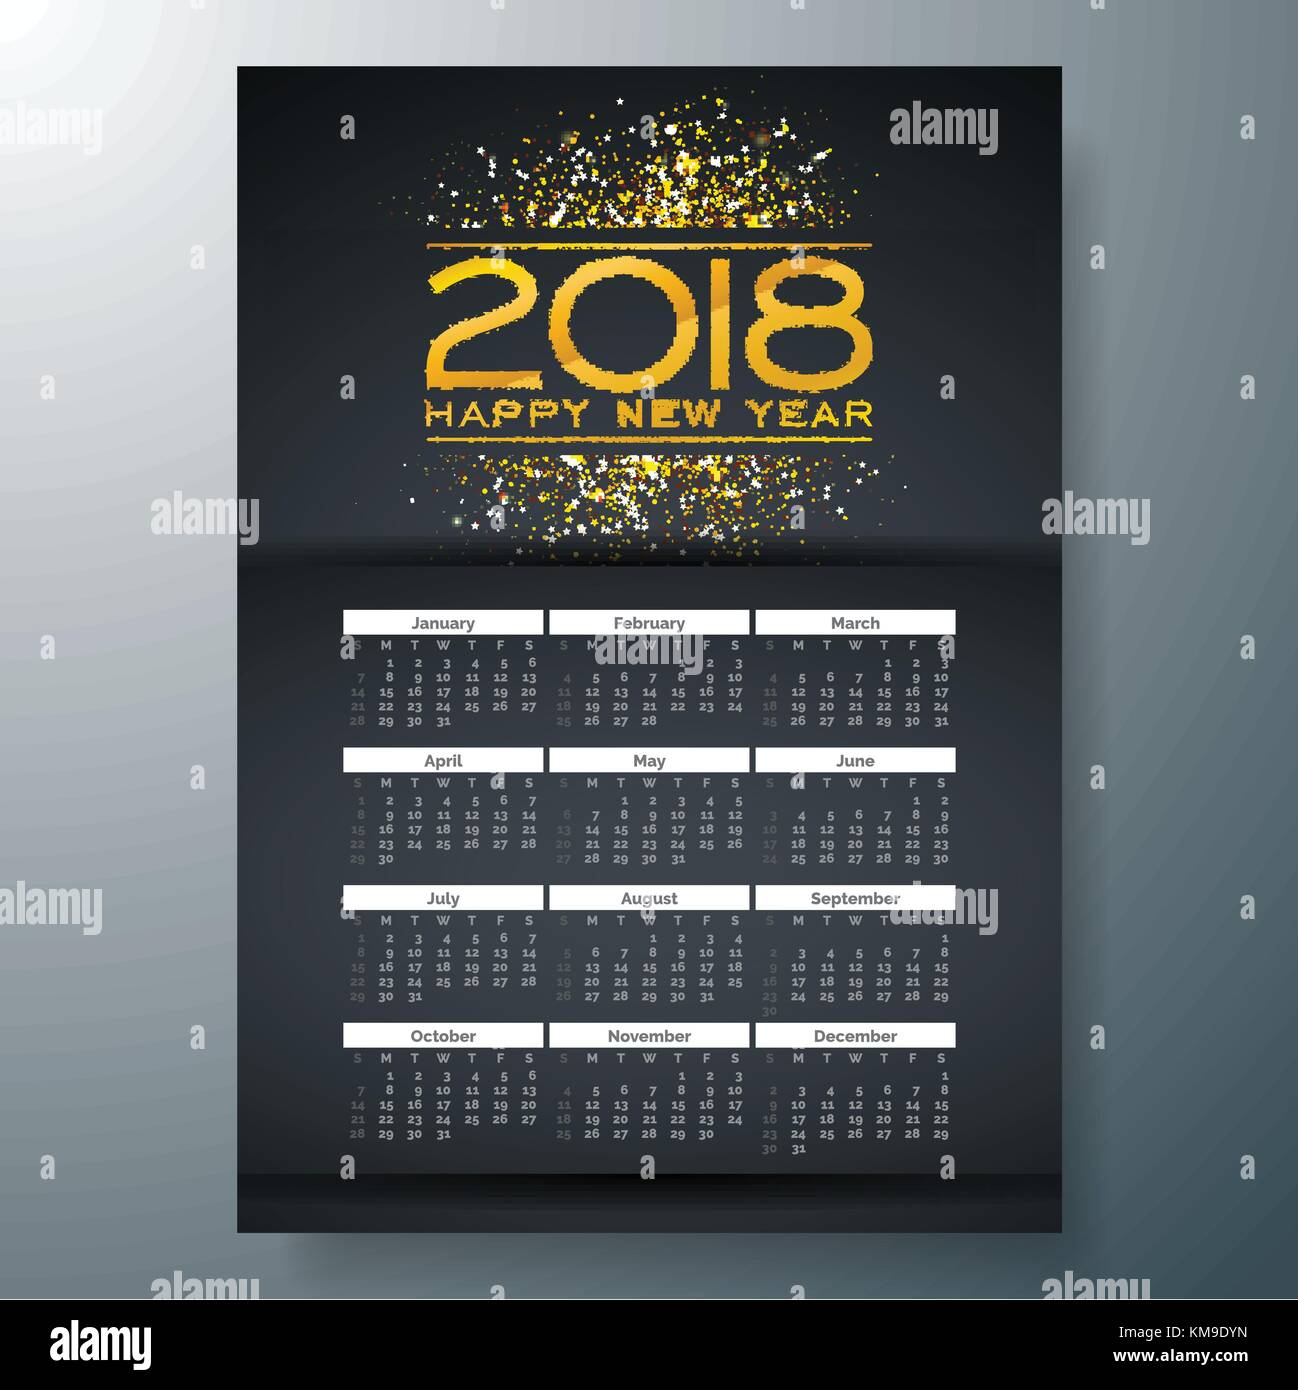 Calendar 2018 Week On Sunday Stock Vector Images - Alamy